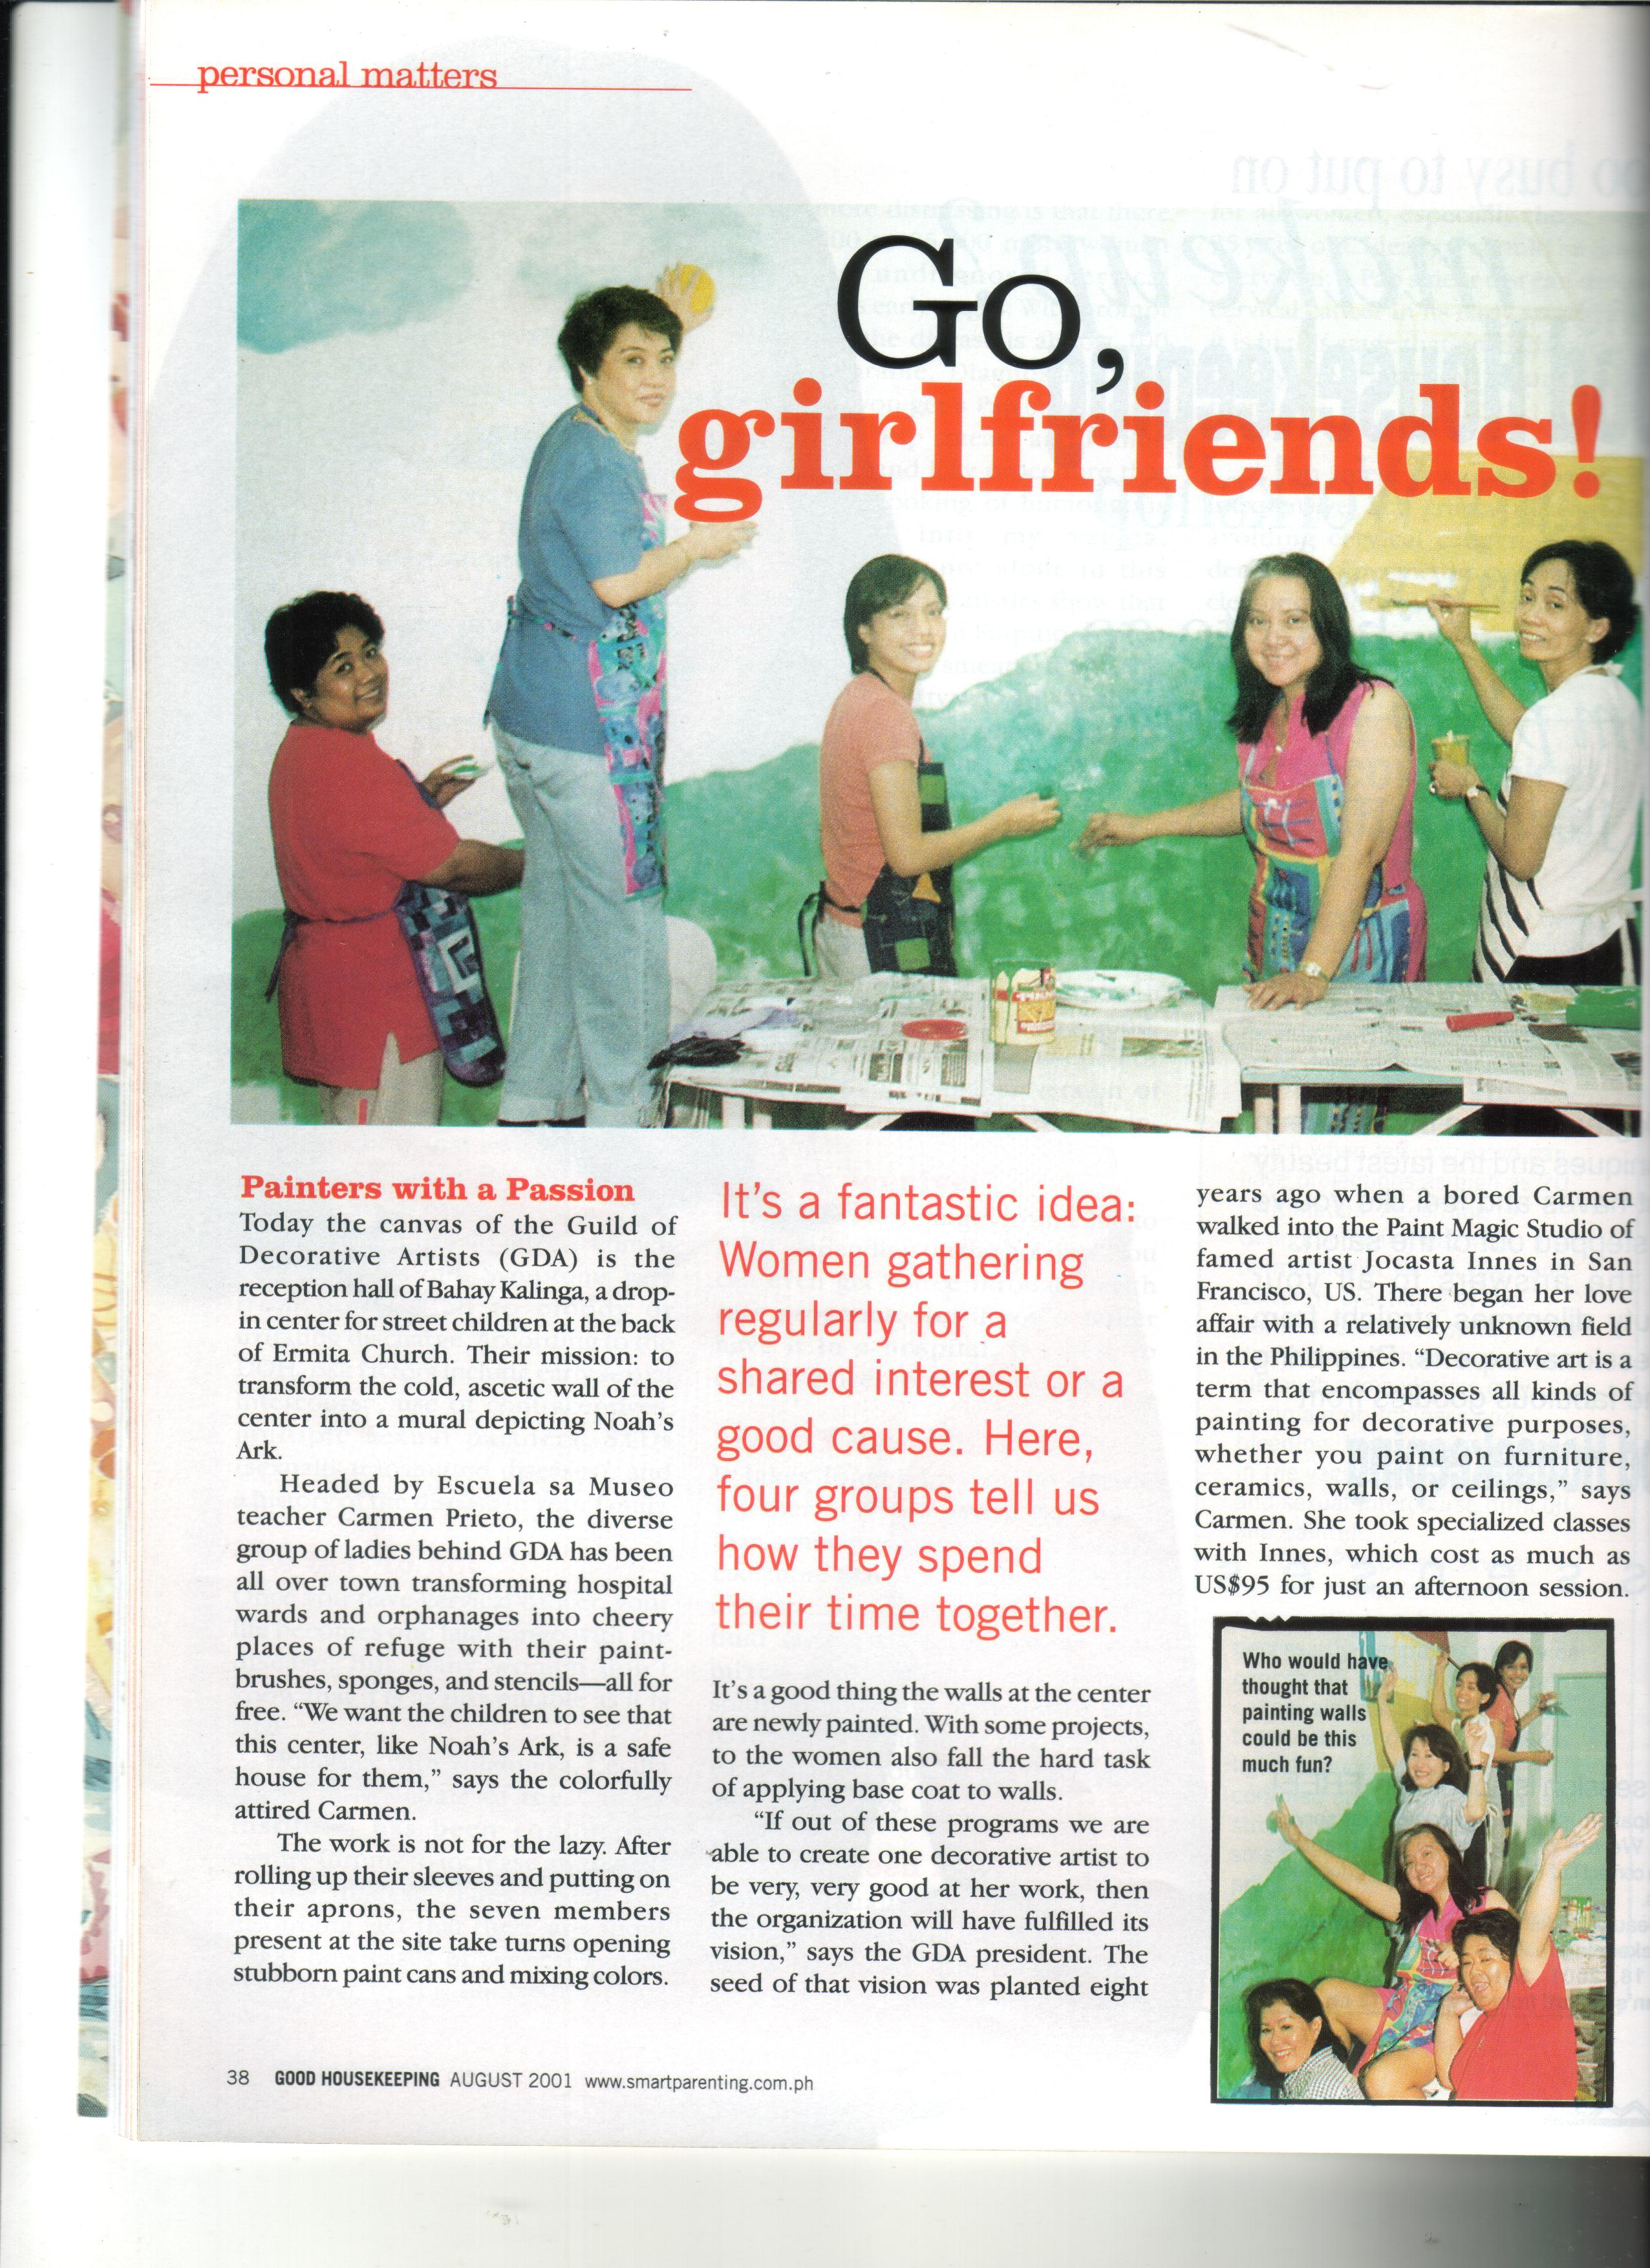 Good Housekeeping Magazine: Go, Girlfriends!